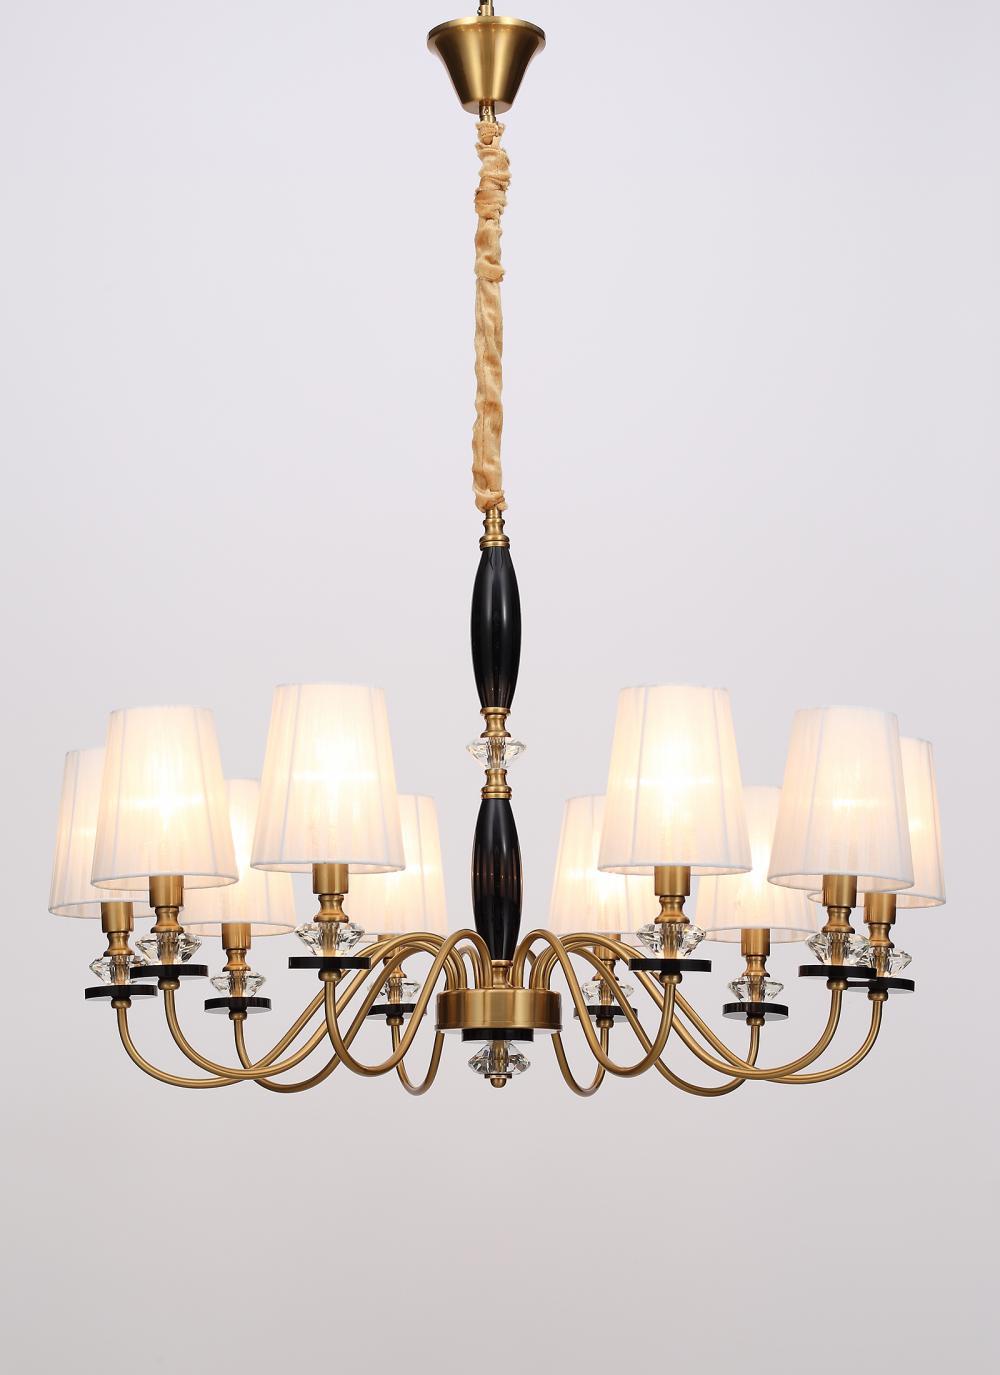 chandelier lighting images